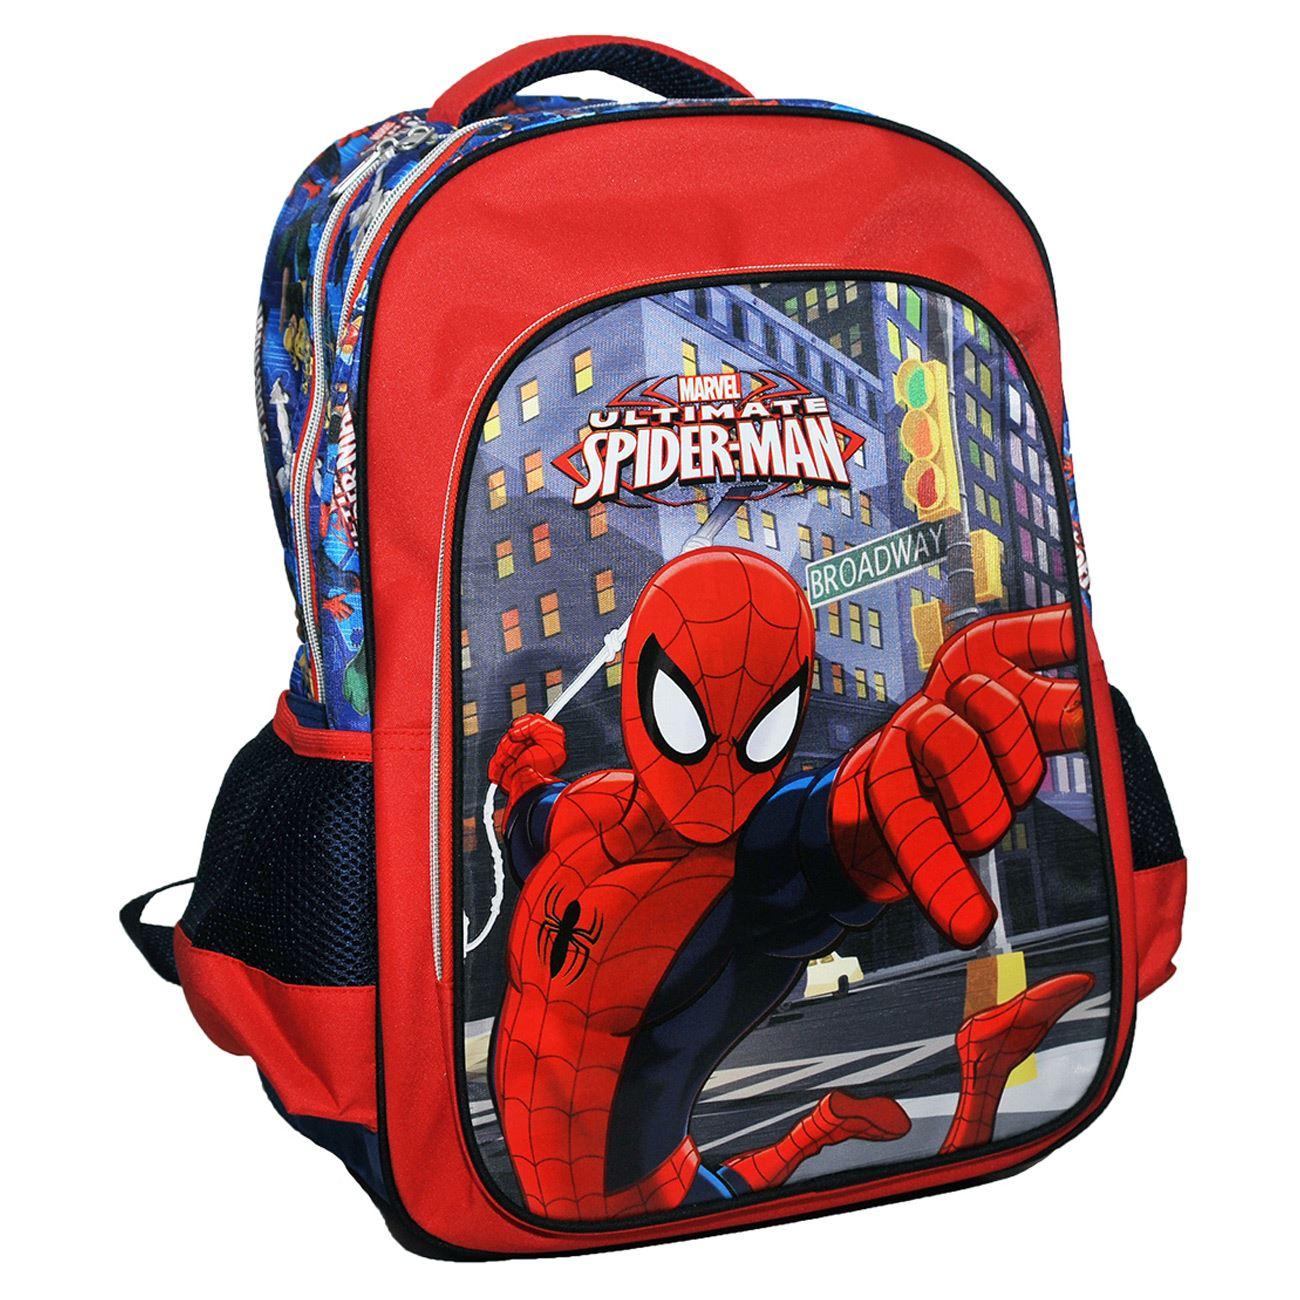 93da0e5529 Σχολική Τσάντα Δημοτικού SPIDERMAN   Τσάντες Δημοτικού για Αγόρια ...